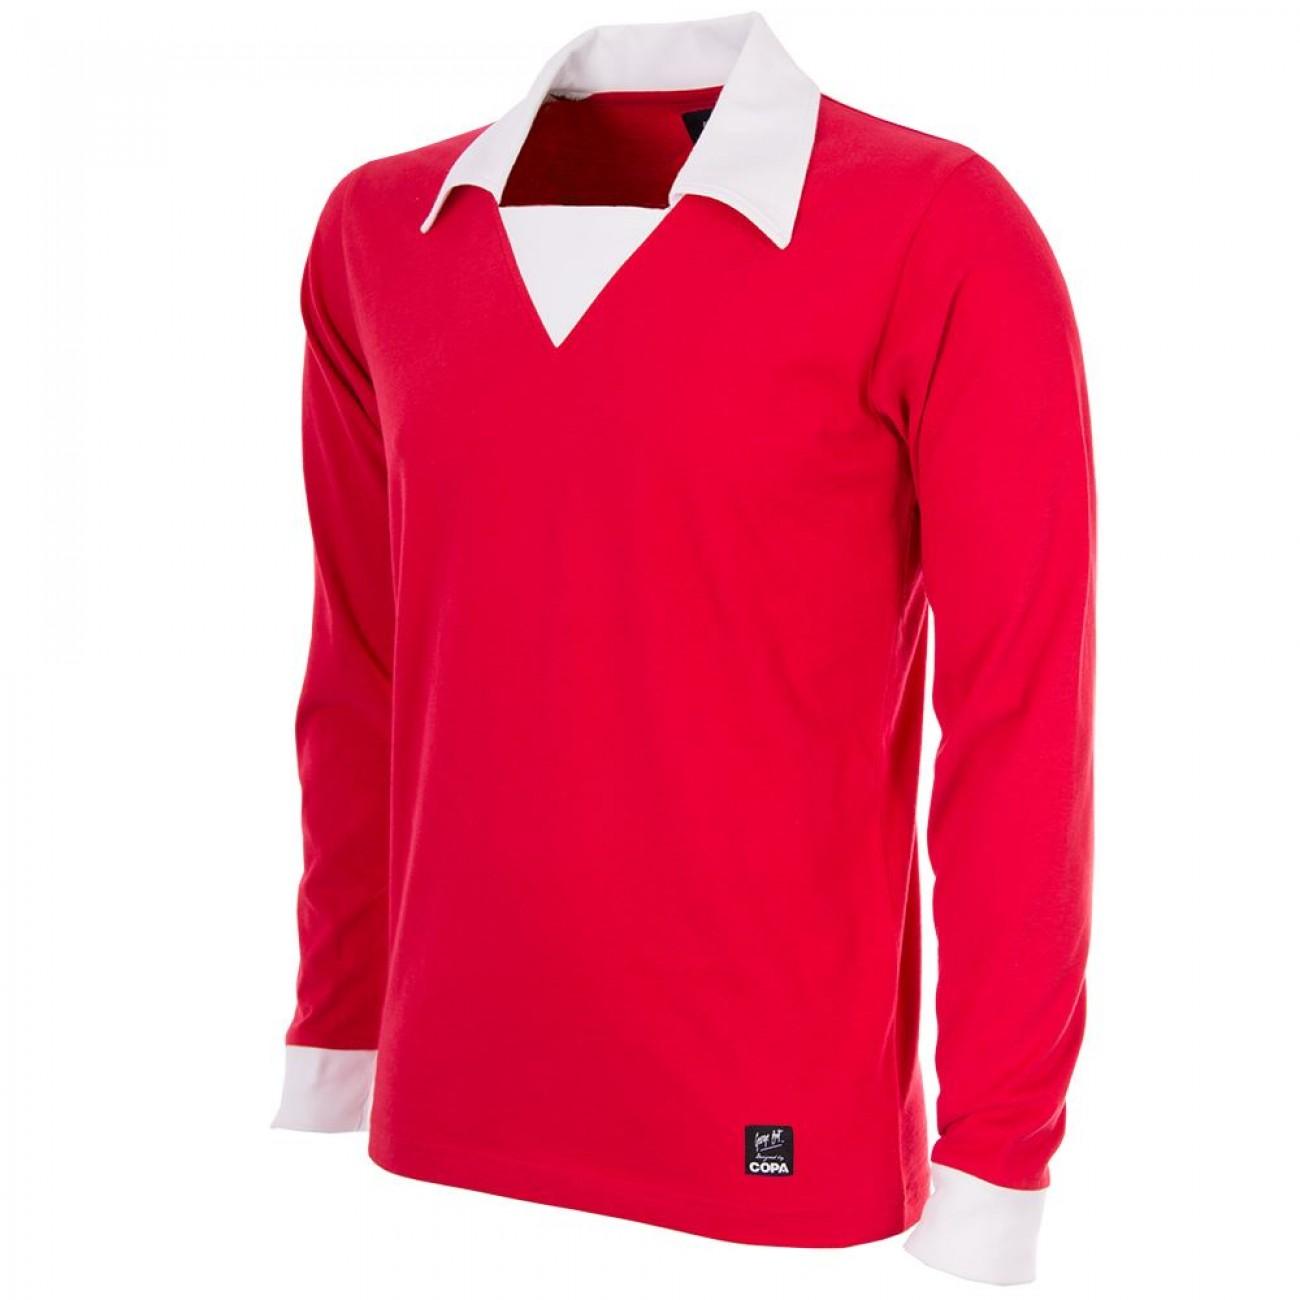 cbbc98c6301 Manchester United 1970 s Vintage shirt George Best